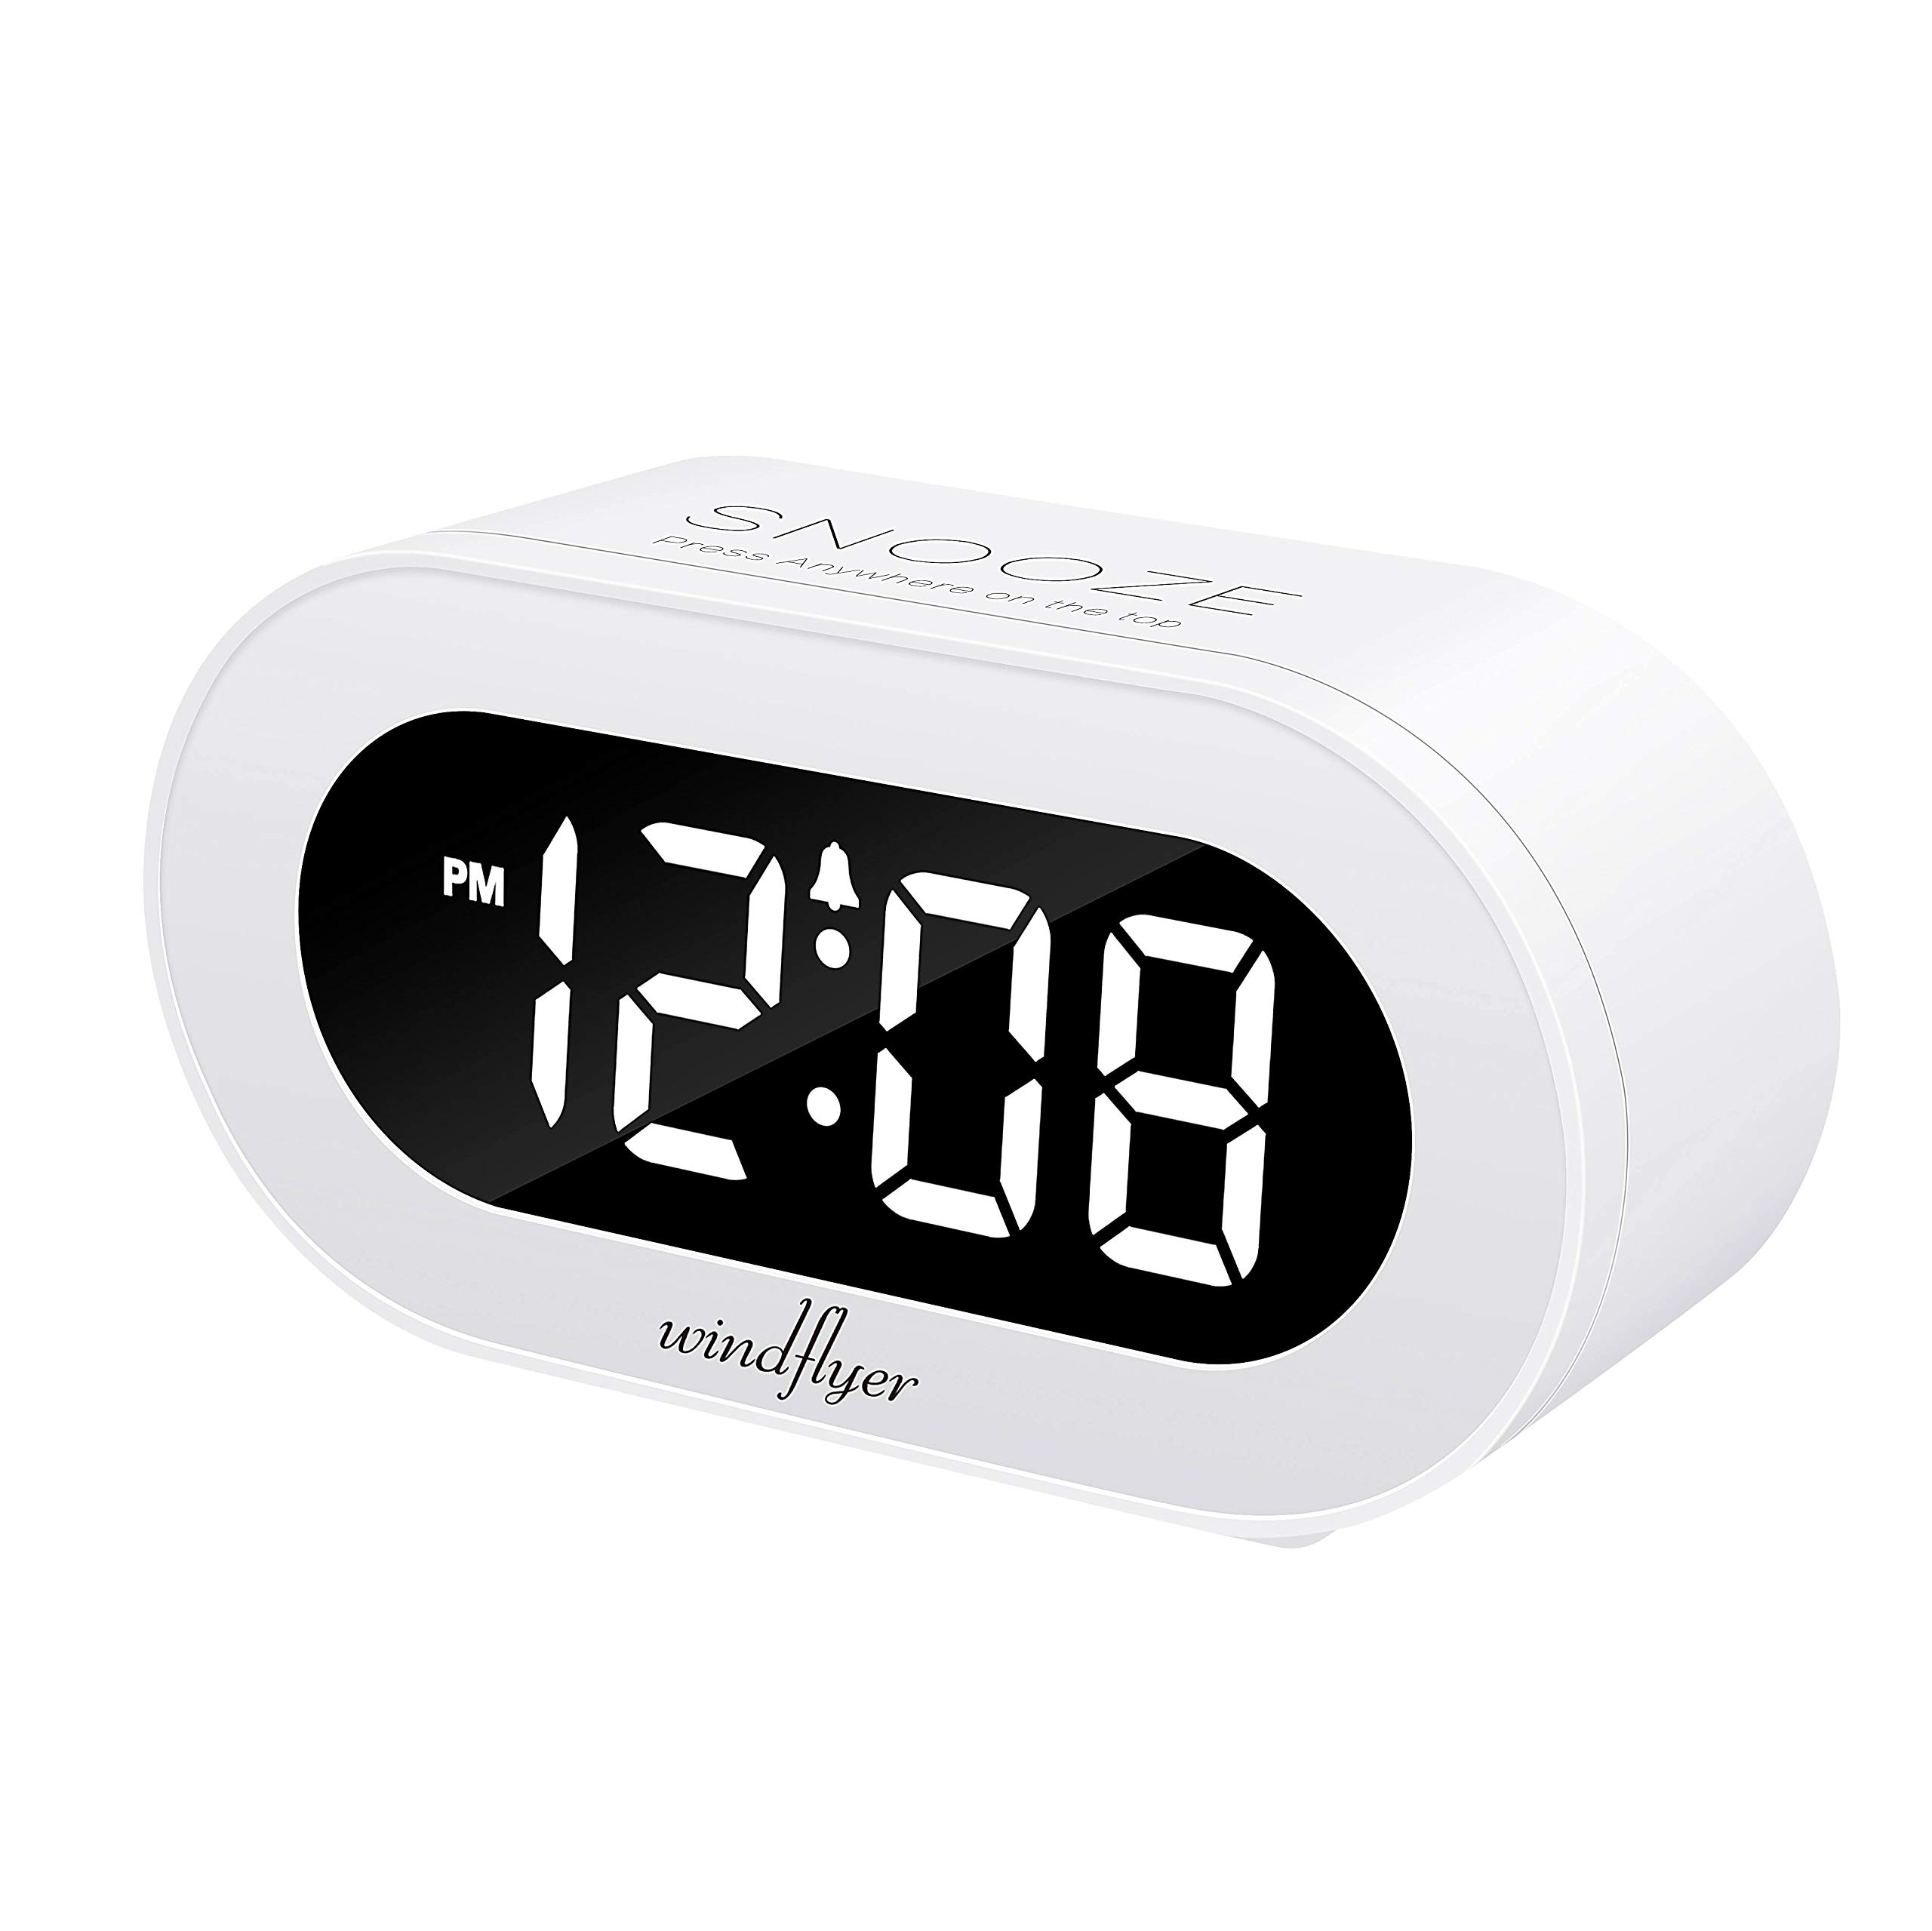 Clocks Home & Garden Kind-Hearted Hot Led Wake Up Alarm Clock 3 Brightness Night Light Digital Modern Design Table Desktop Clocks Natural Sounds Alarm Home Decor Fine Workmanship